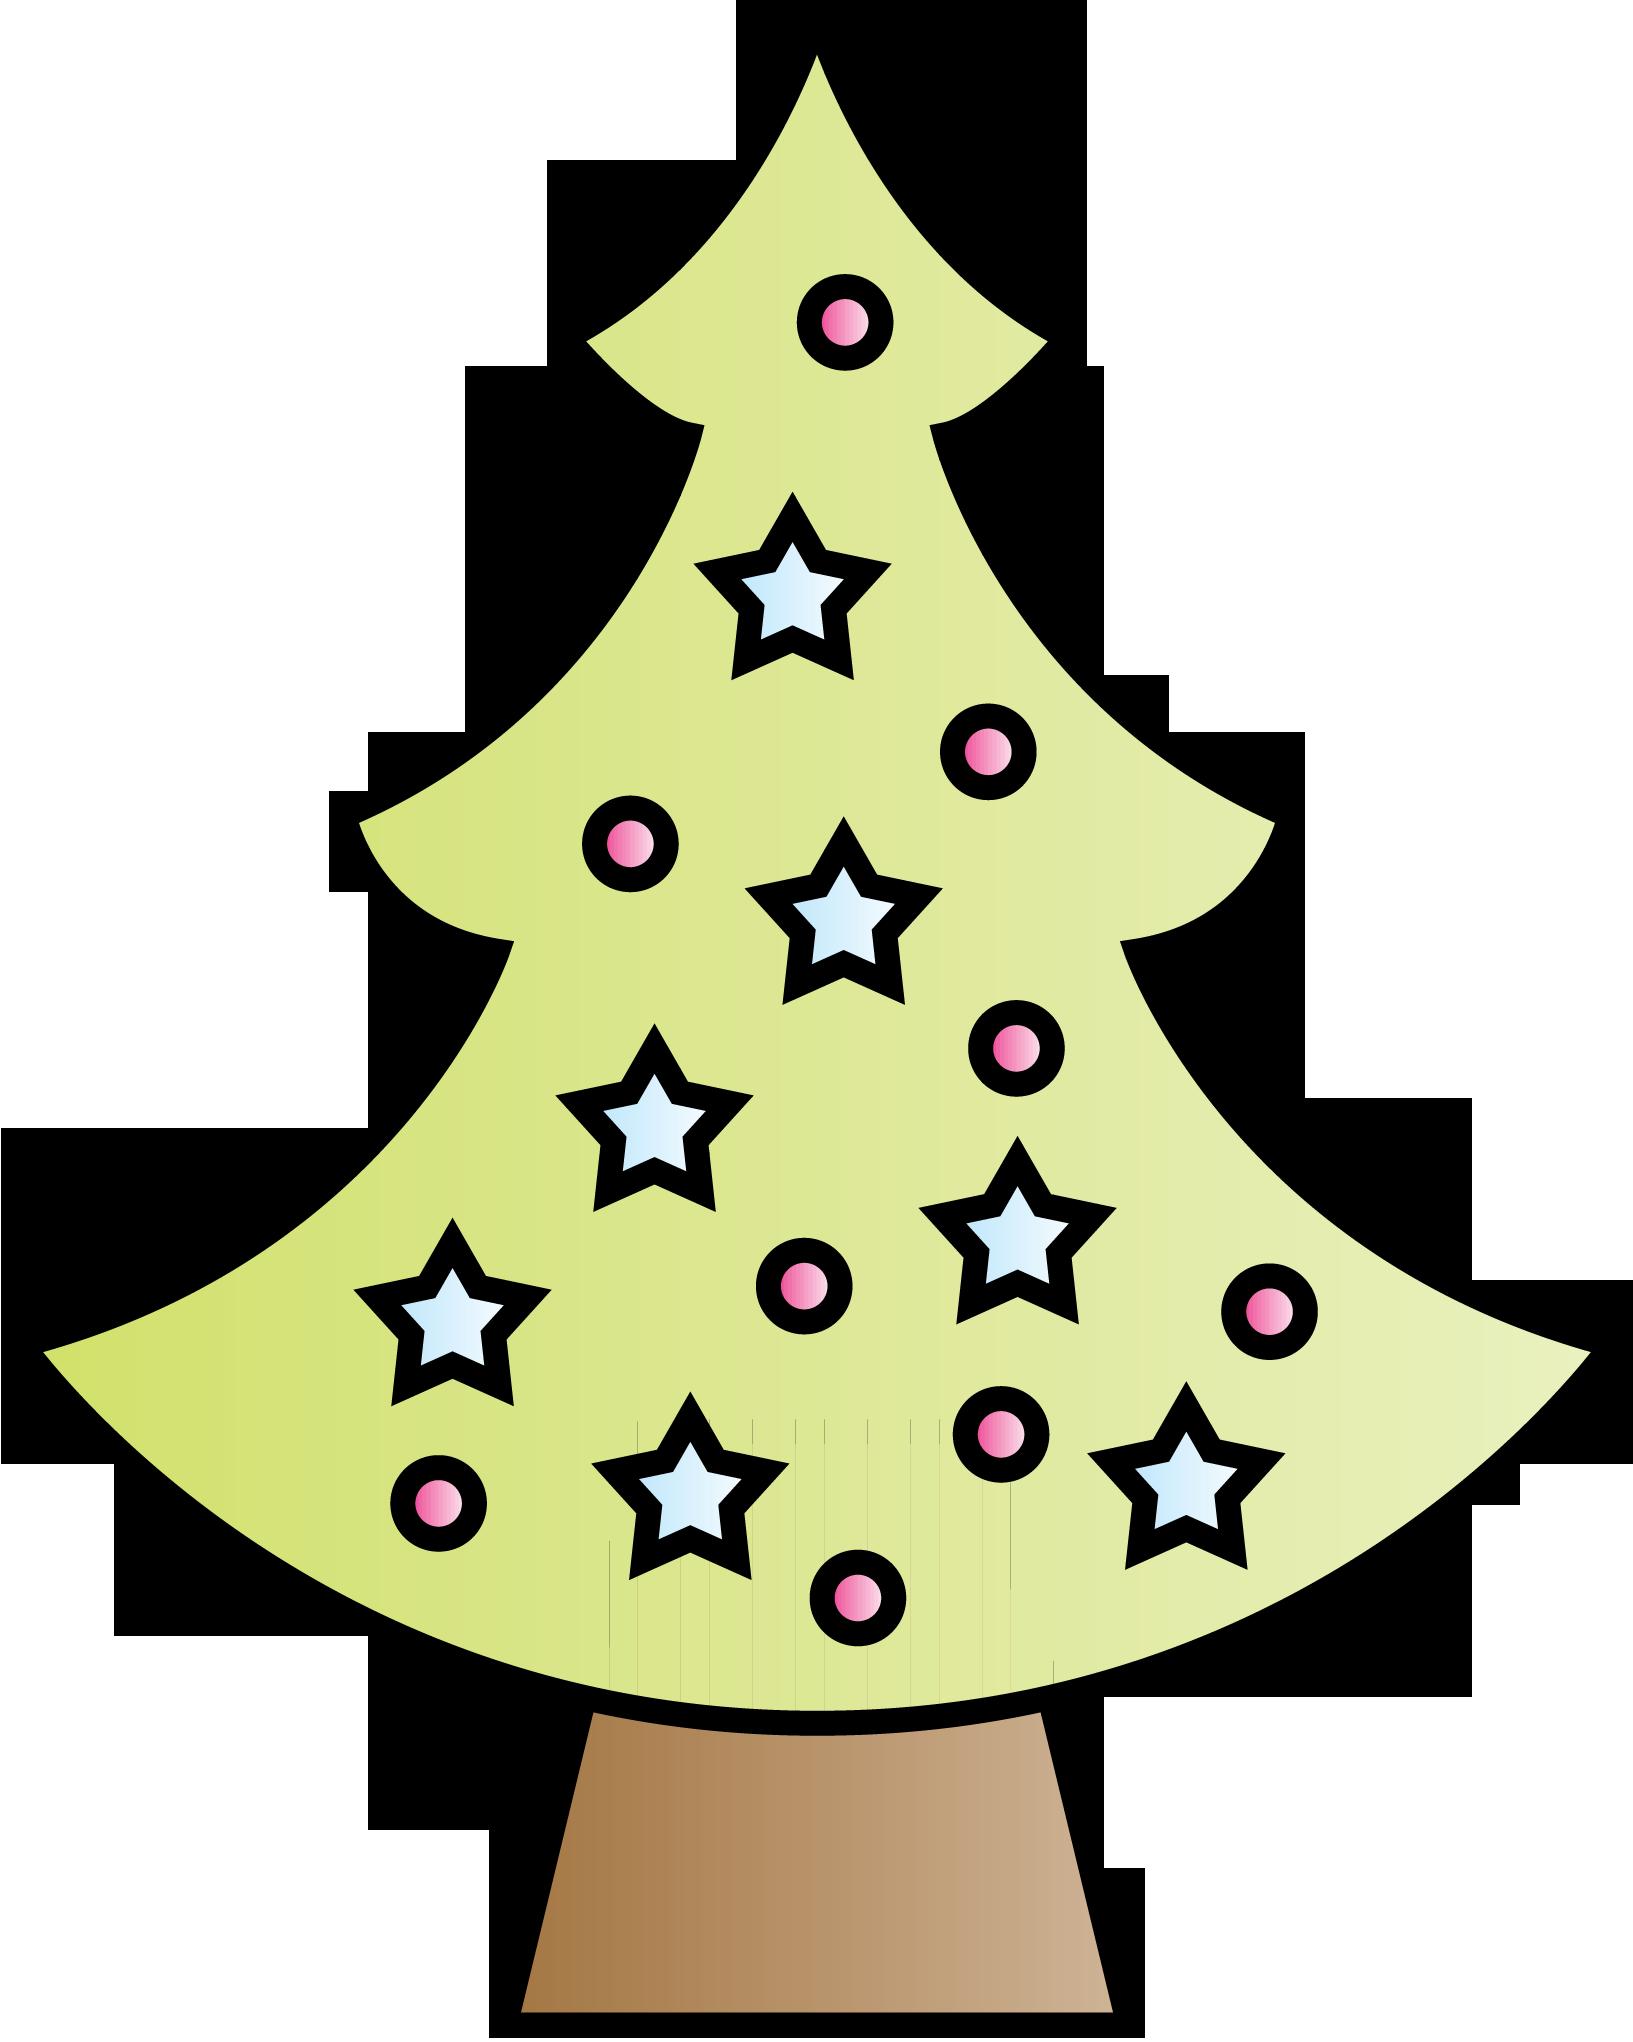 Tree clipart word. Free revidevi wordpress com